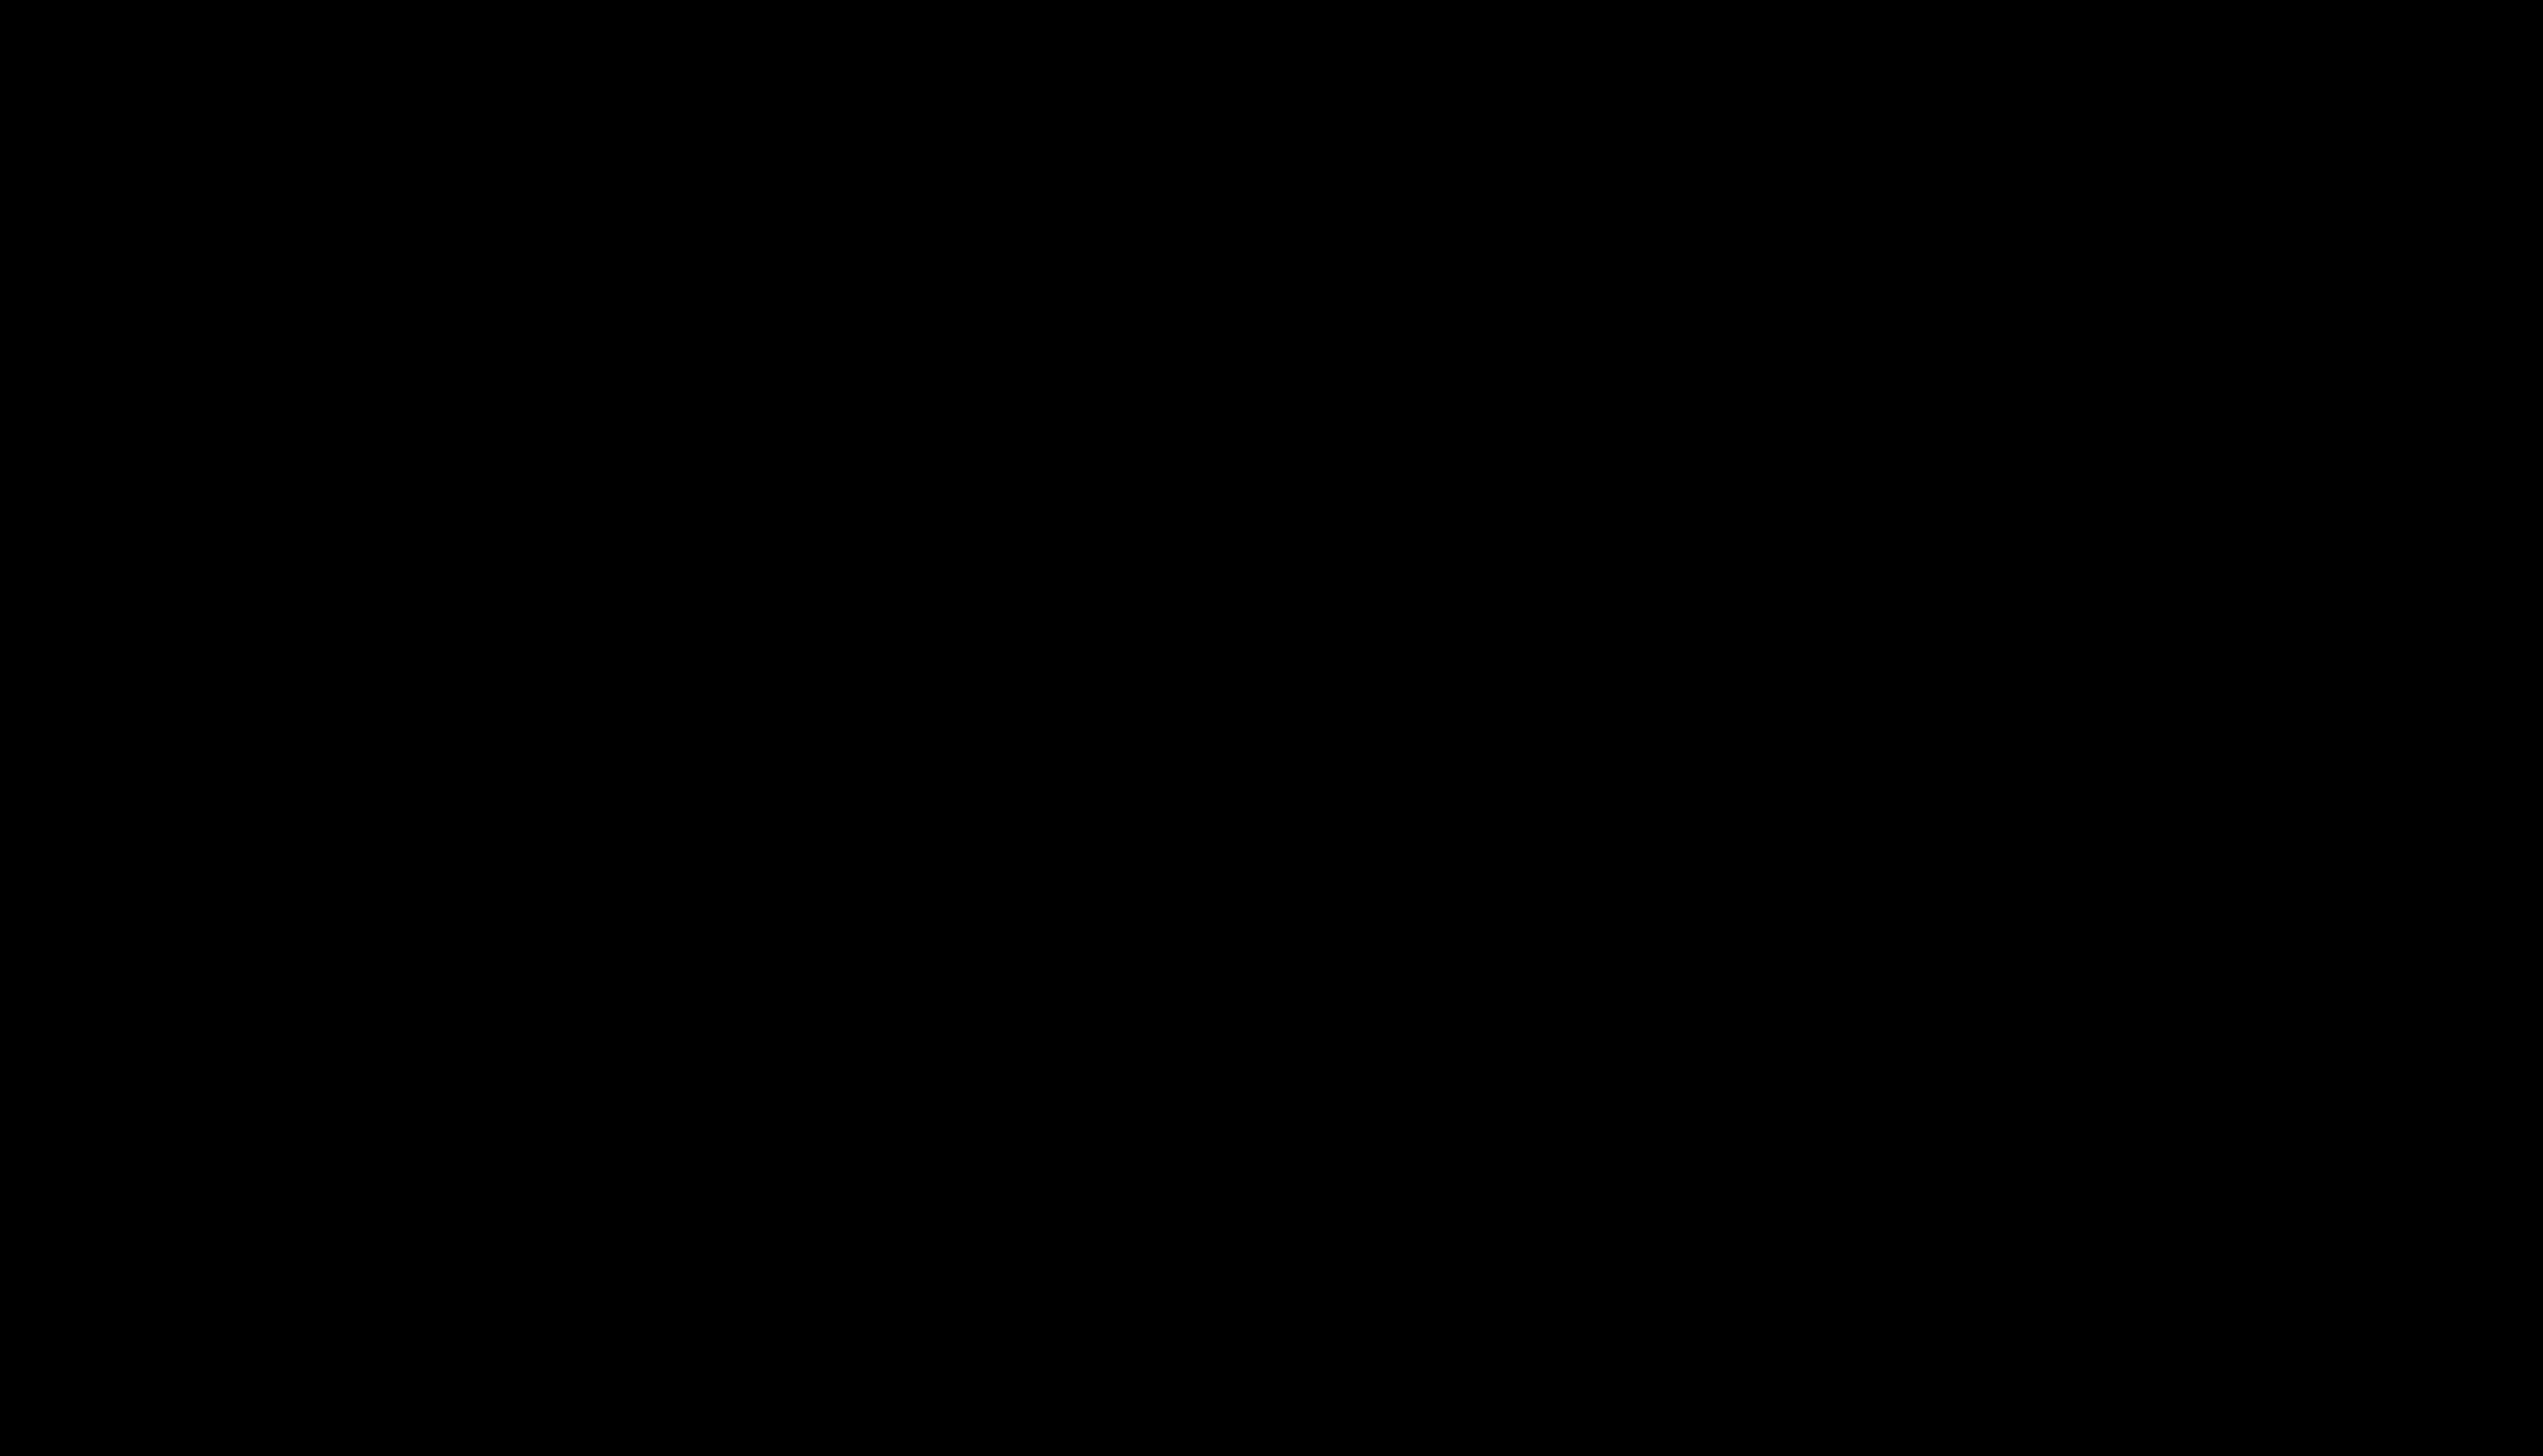 Nucase apoia XI Jornada de Recolha de Medicamentos